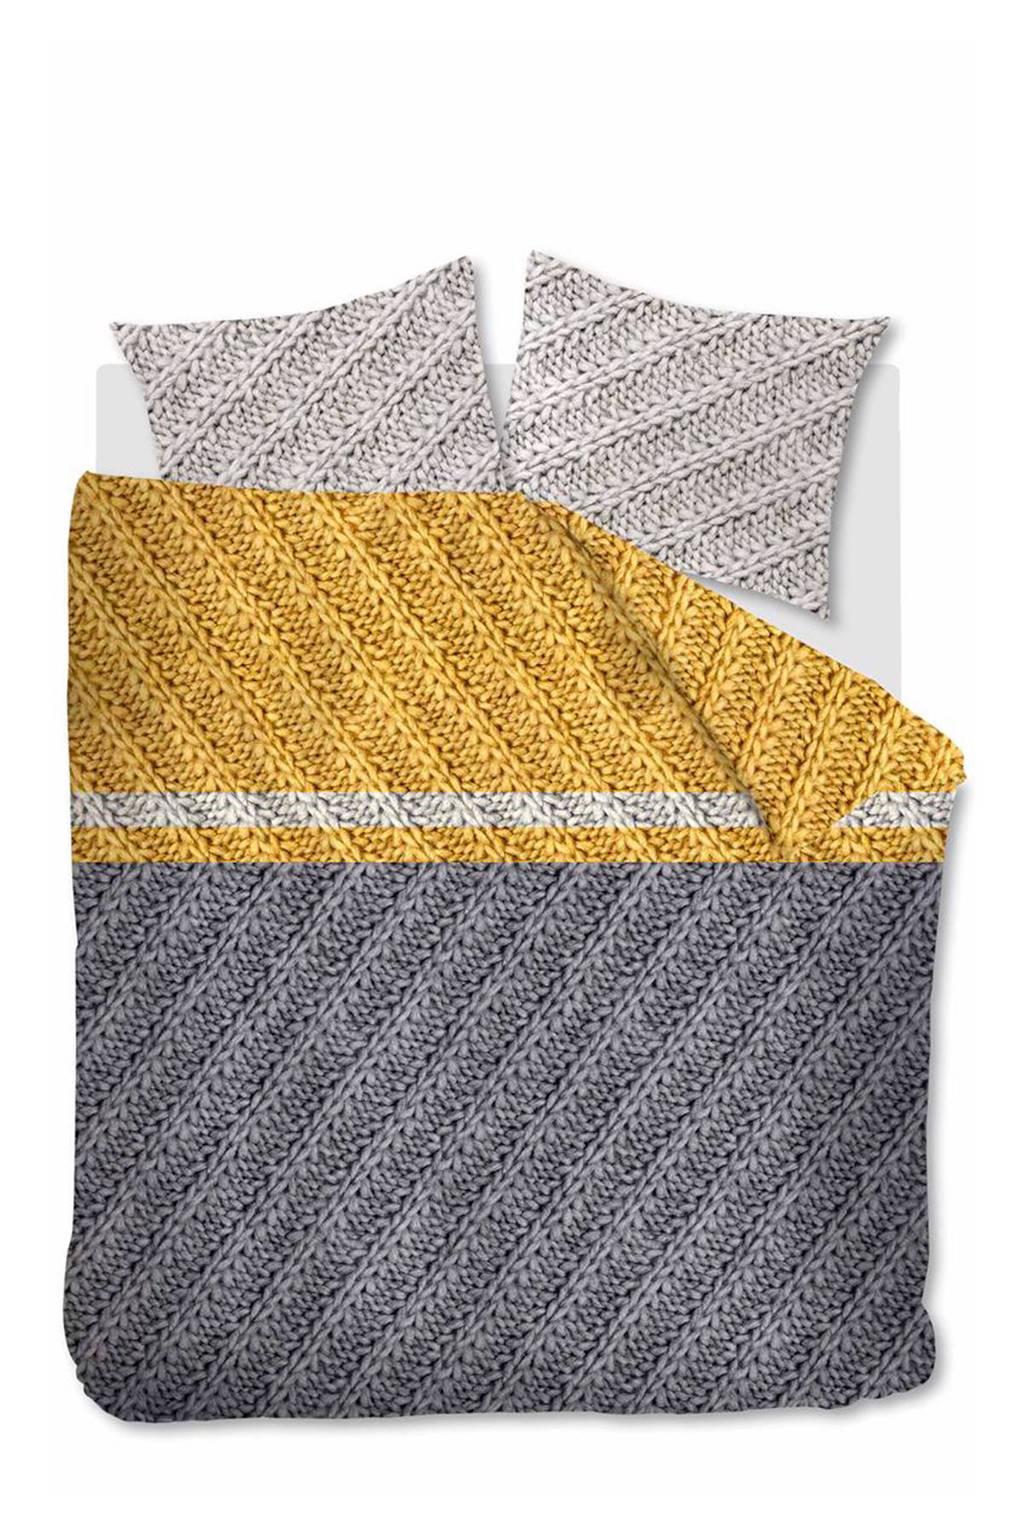 Beddinghouse flanellen dekbedovertrek 2 persoons, 2 persoons (200 cm breed), Taupe/okergeel/wit